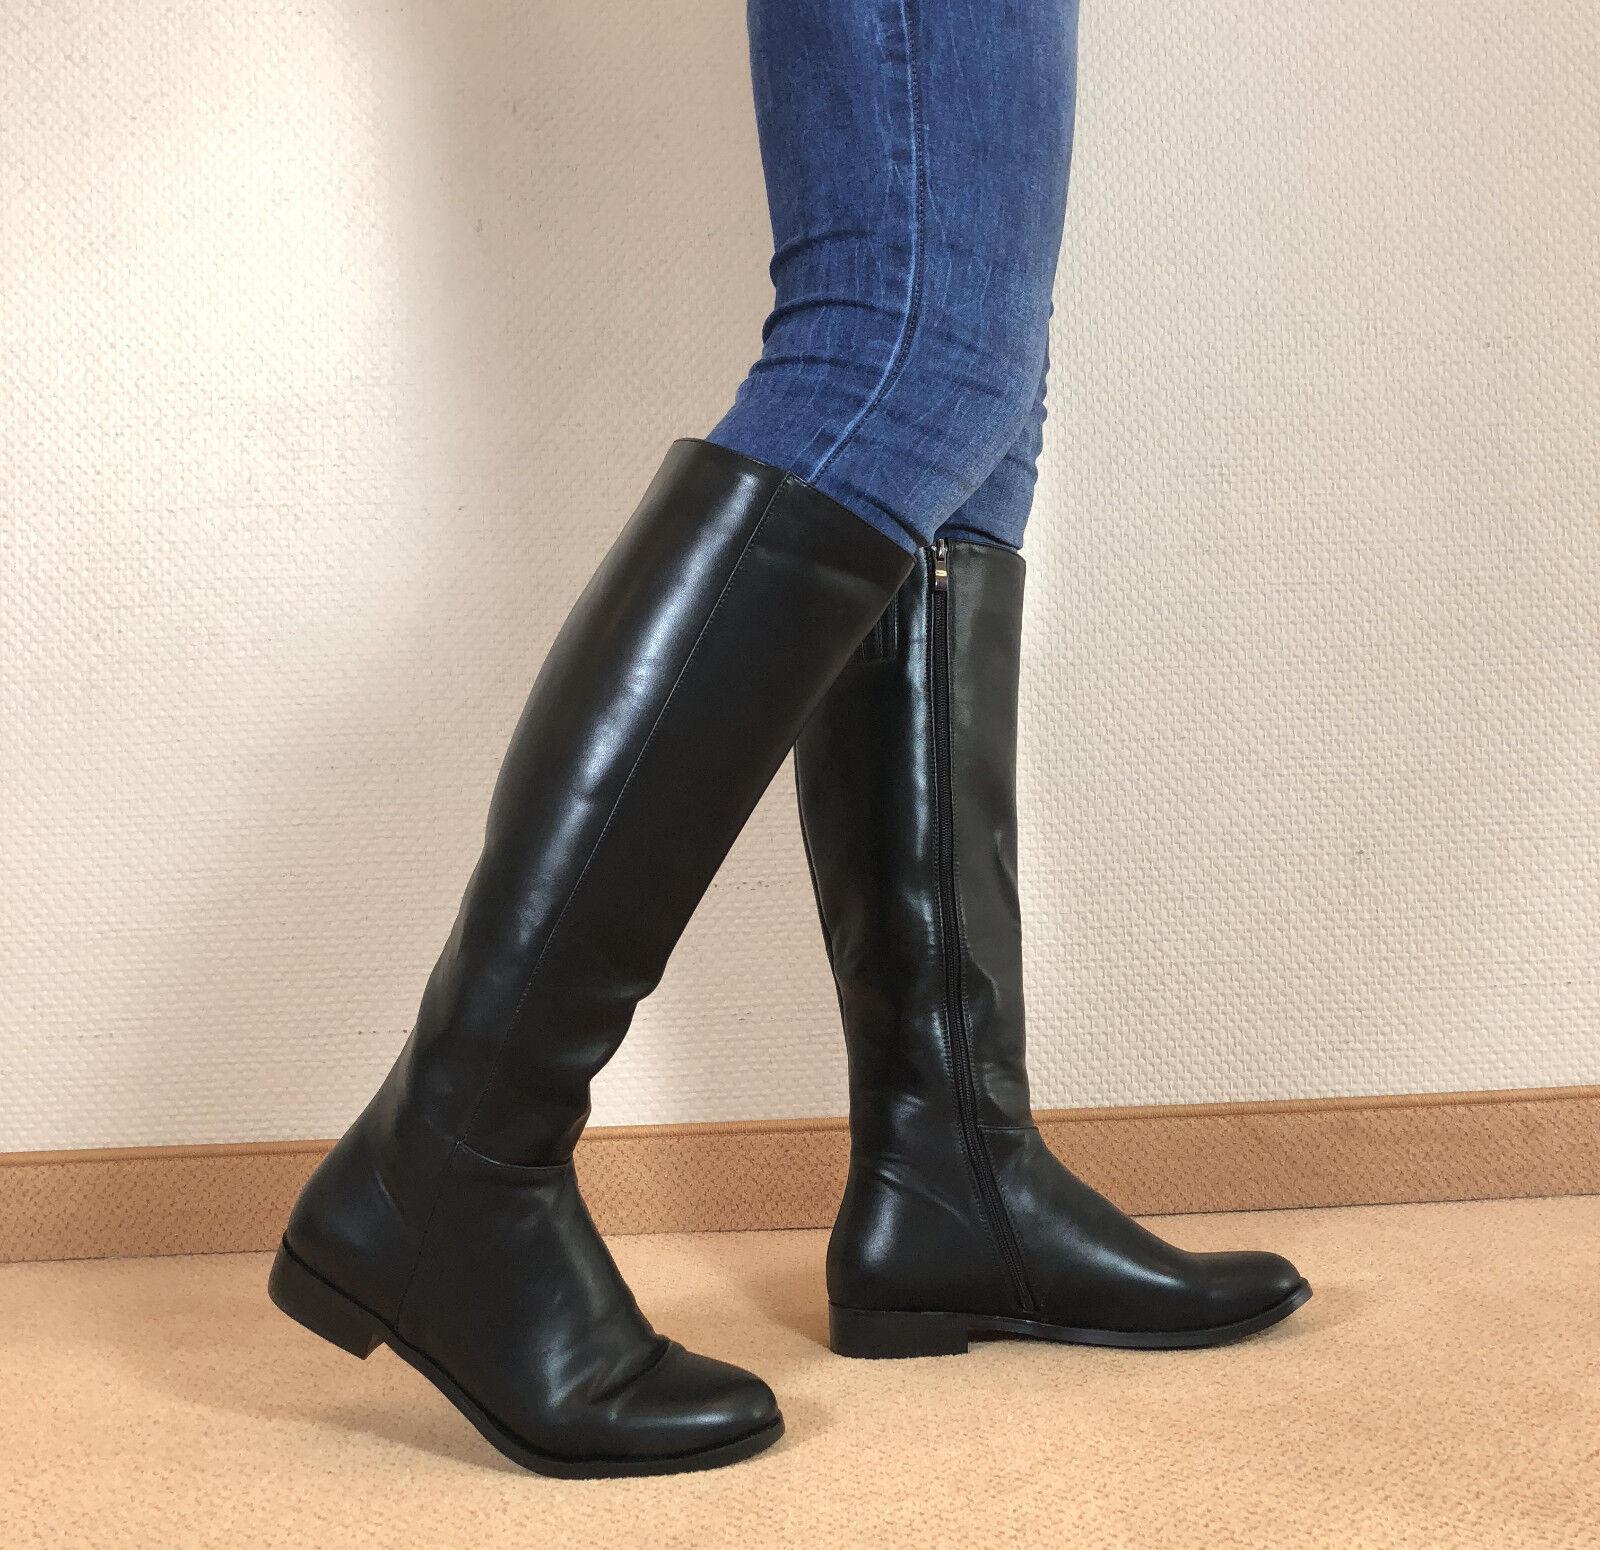 top! en exclusiva sexy zapatos señora botas rodilla plana botas mujers Boots e2